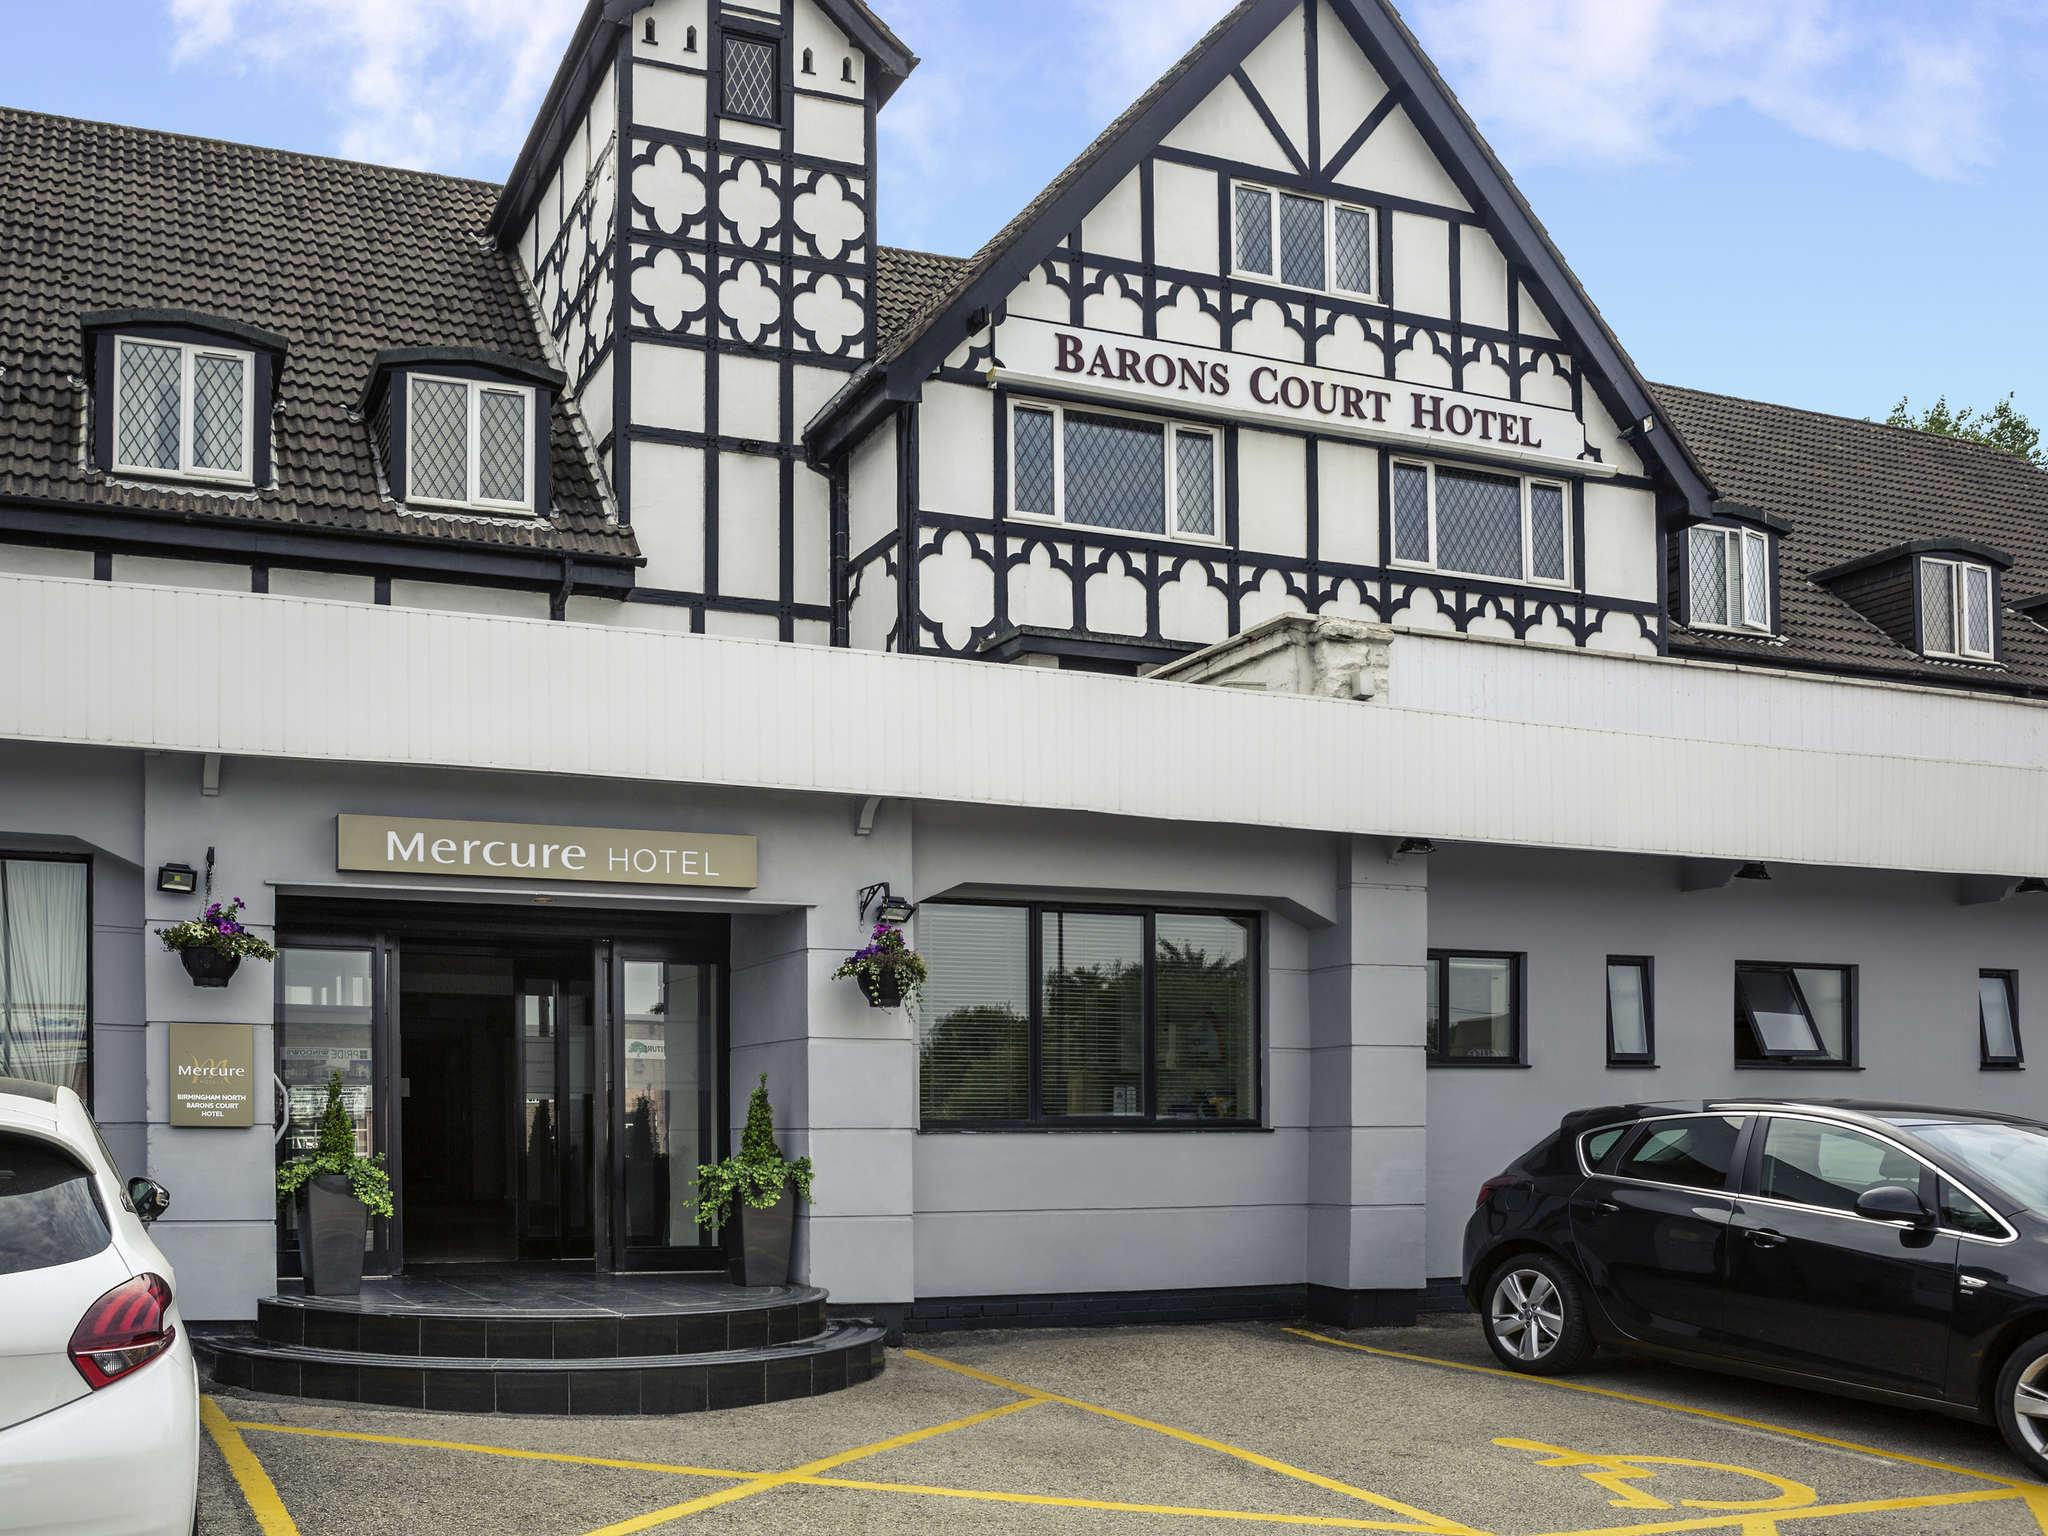 Hotel – Mercure Birmingham North Barons Court Hotel